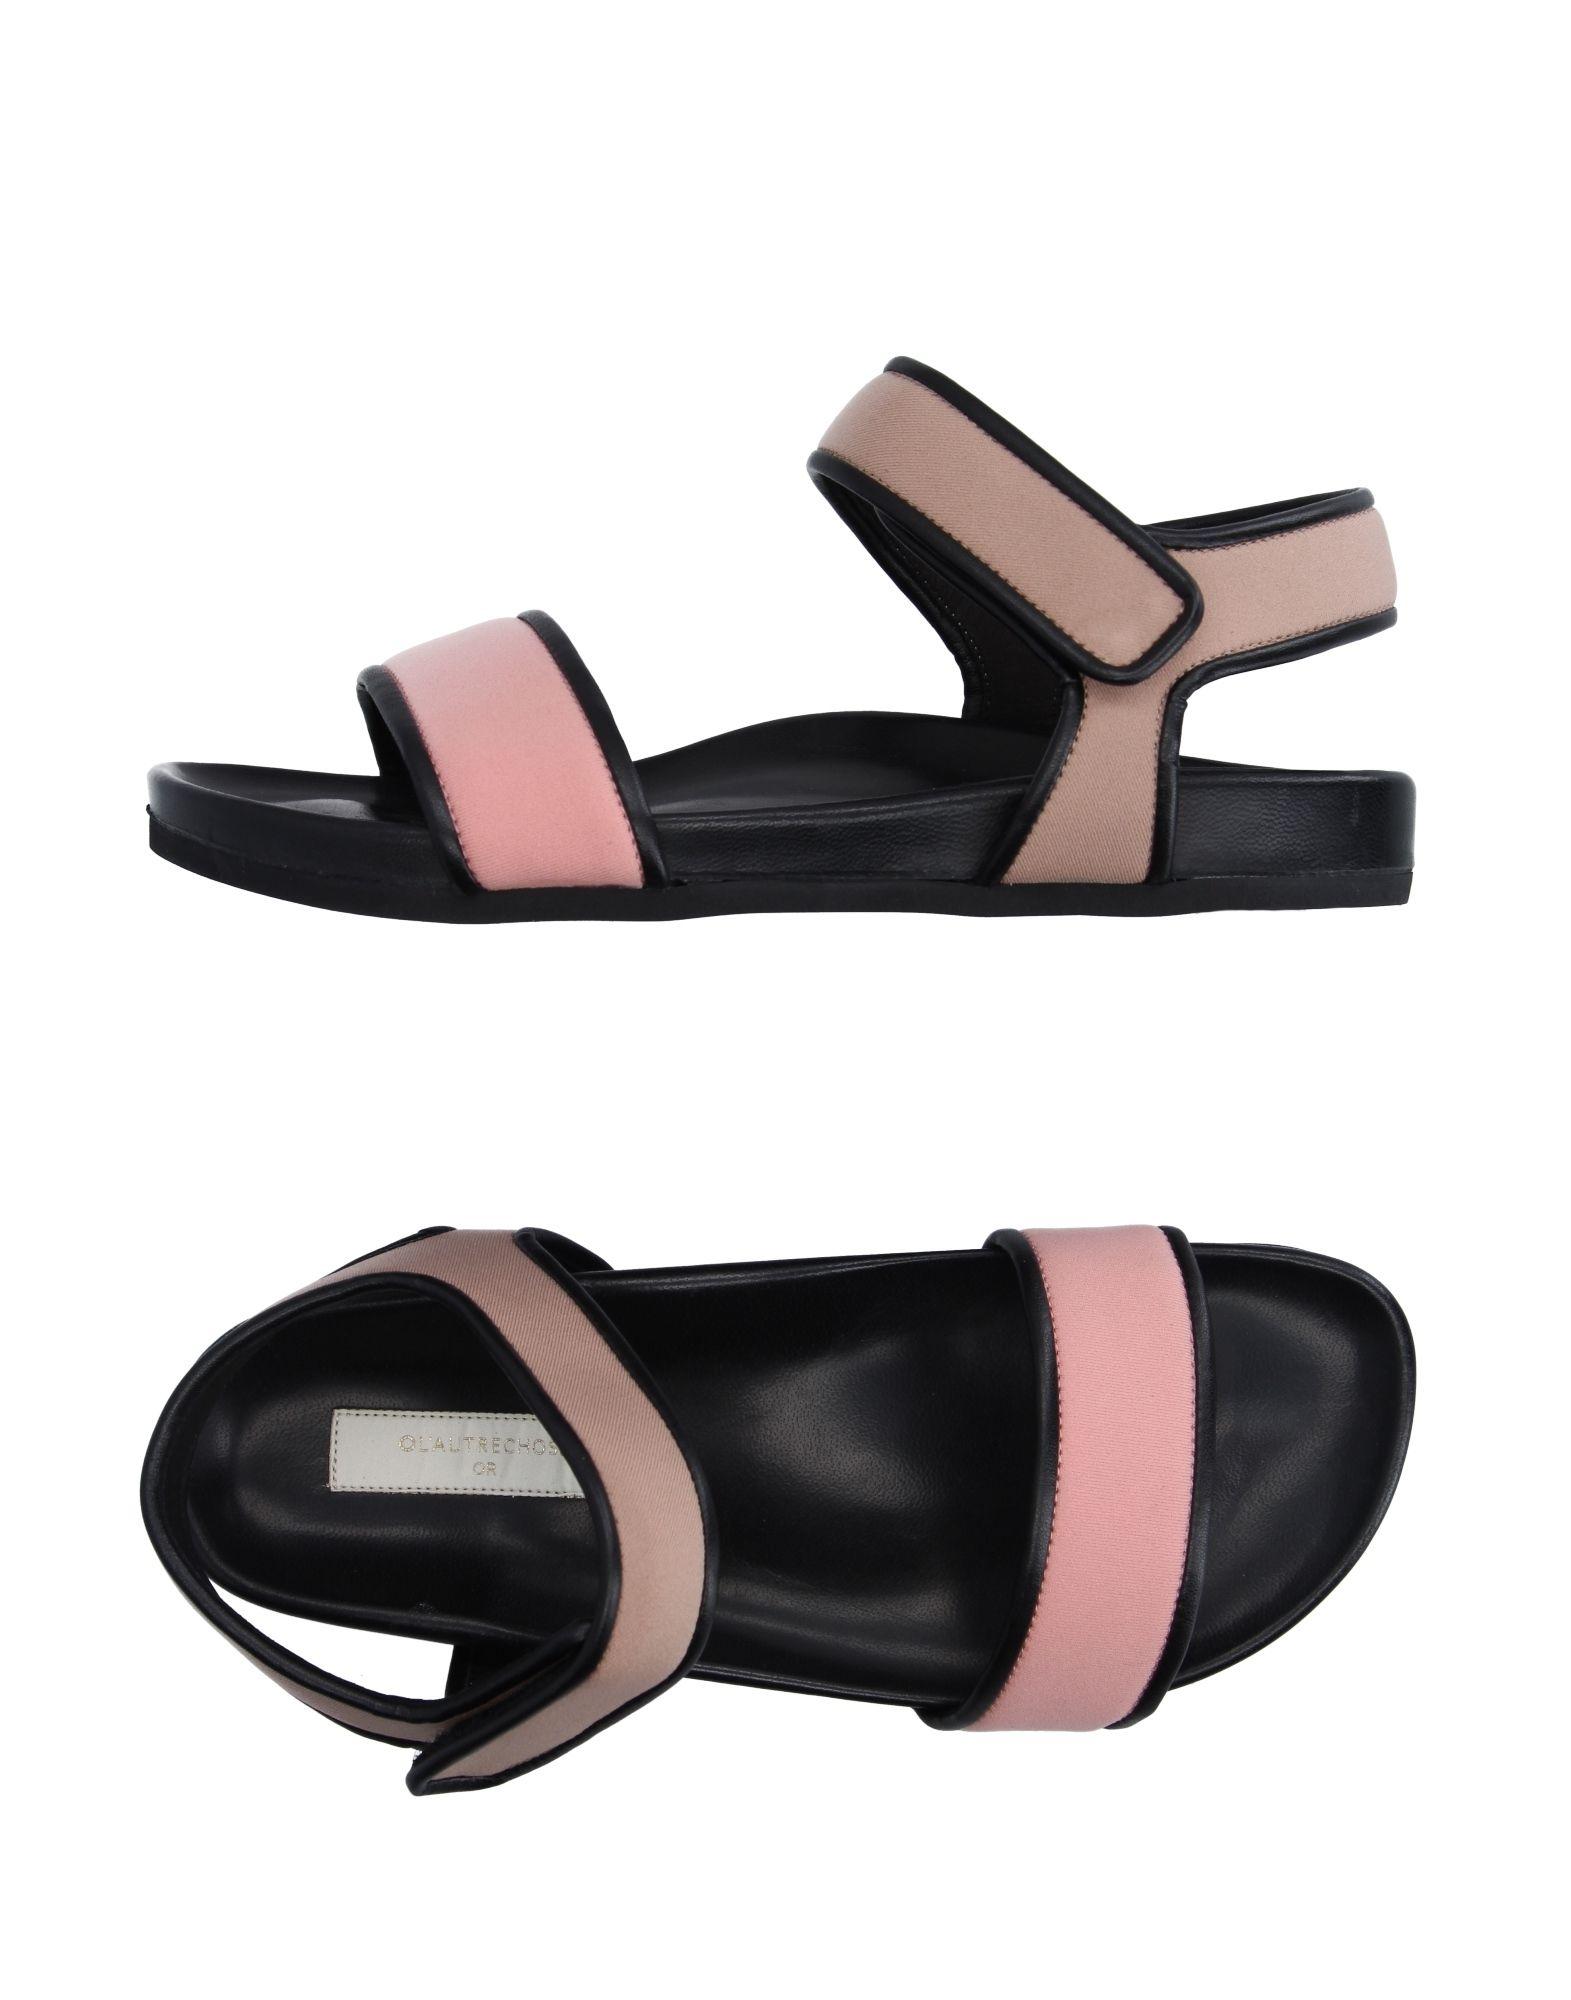 L' Autre Chose Sandalen Damen  11188813VT Gute Qualität beliebte Schuhe